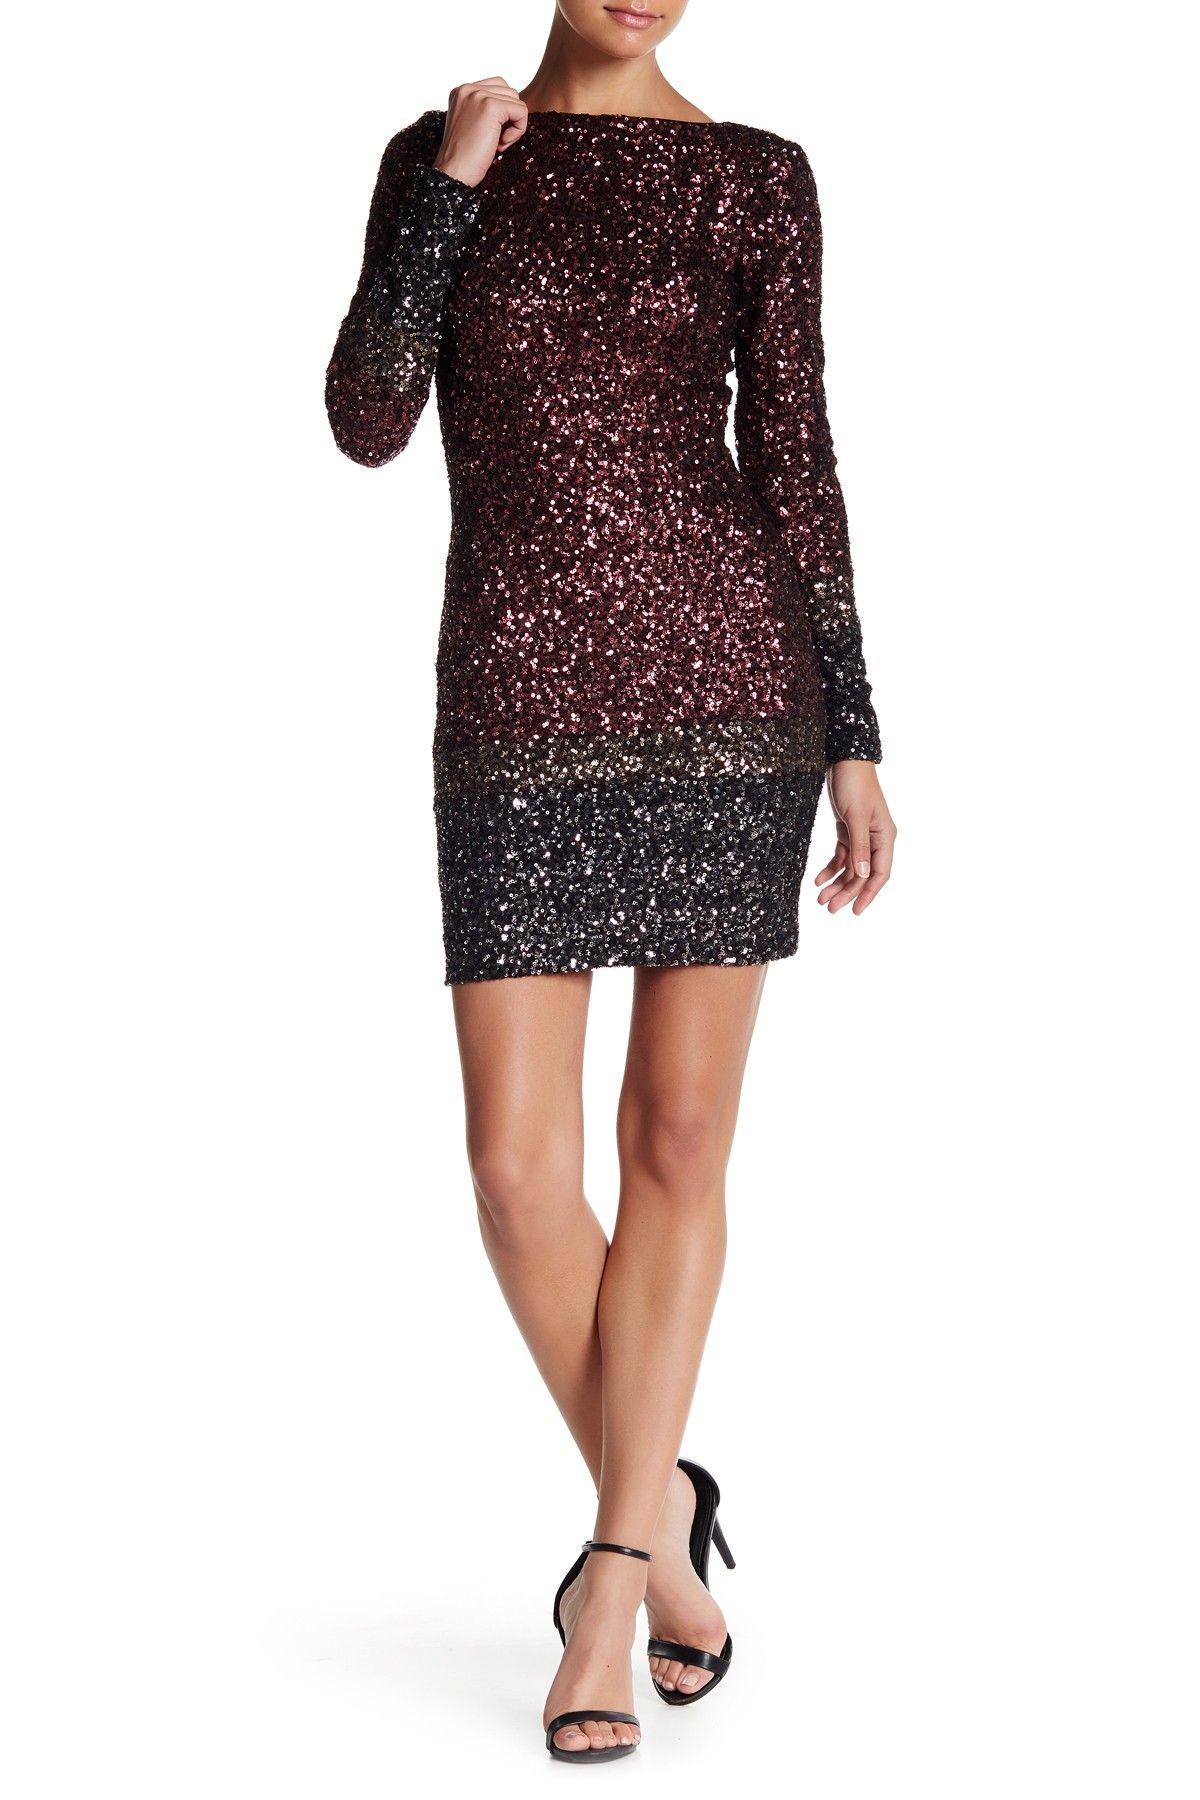 Embellished long sleeve back zip dress by dress the population on